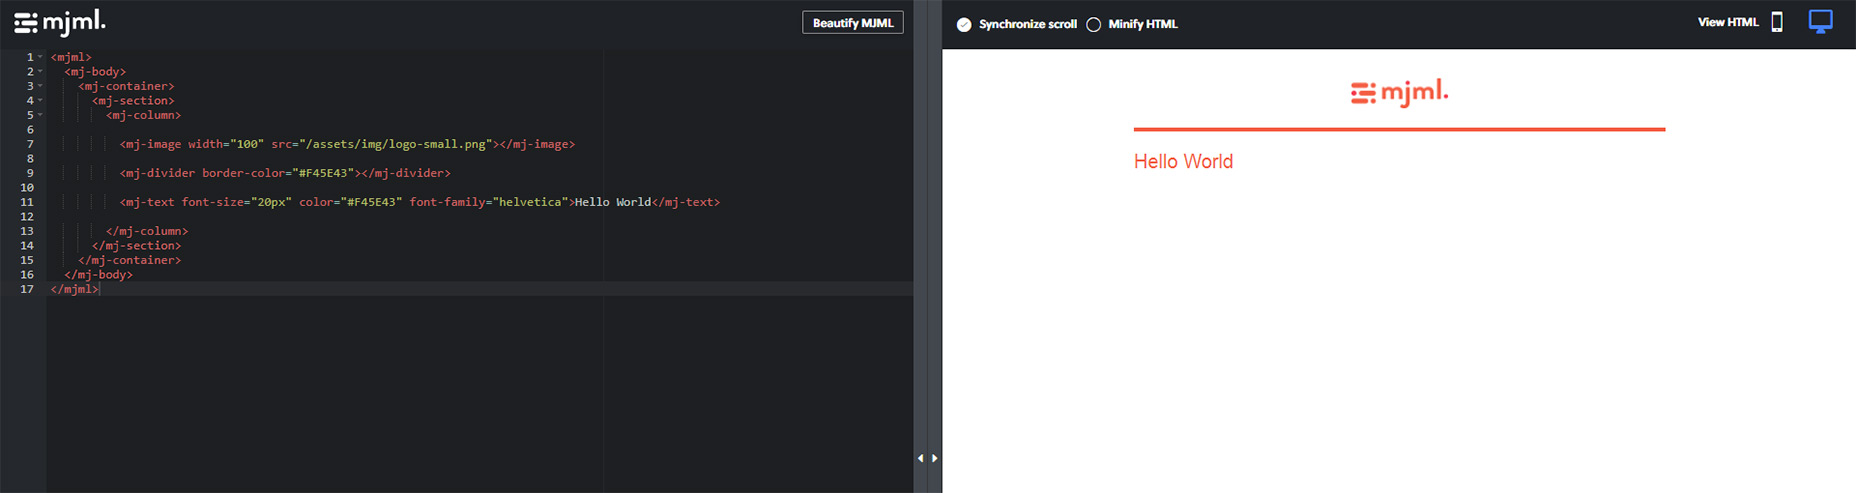 08-mjml-coding-webapp-ide